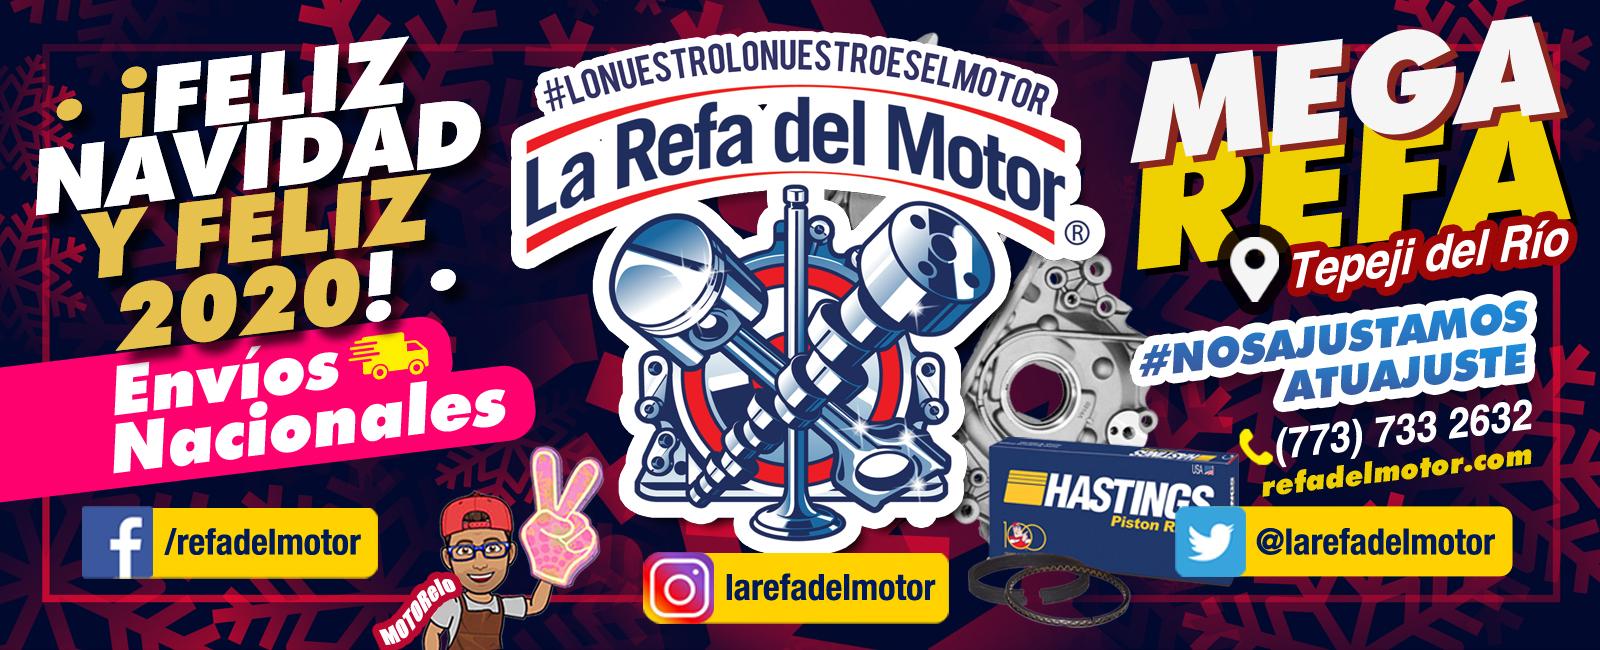 la-refa-del-motor-ajuste-para-tu-motor-almanaque-mx-tepeji-del-rio-venta-en-linea-mega-refa-feliz-navidad-2019